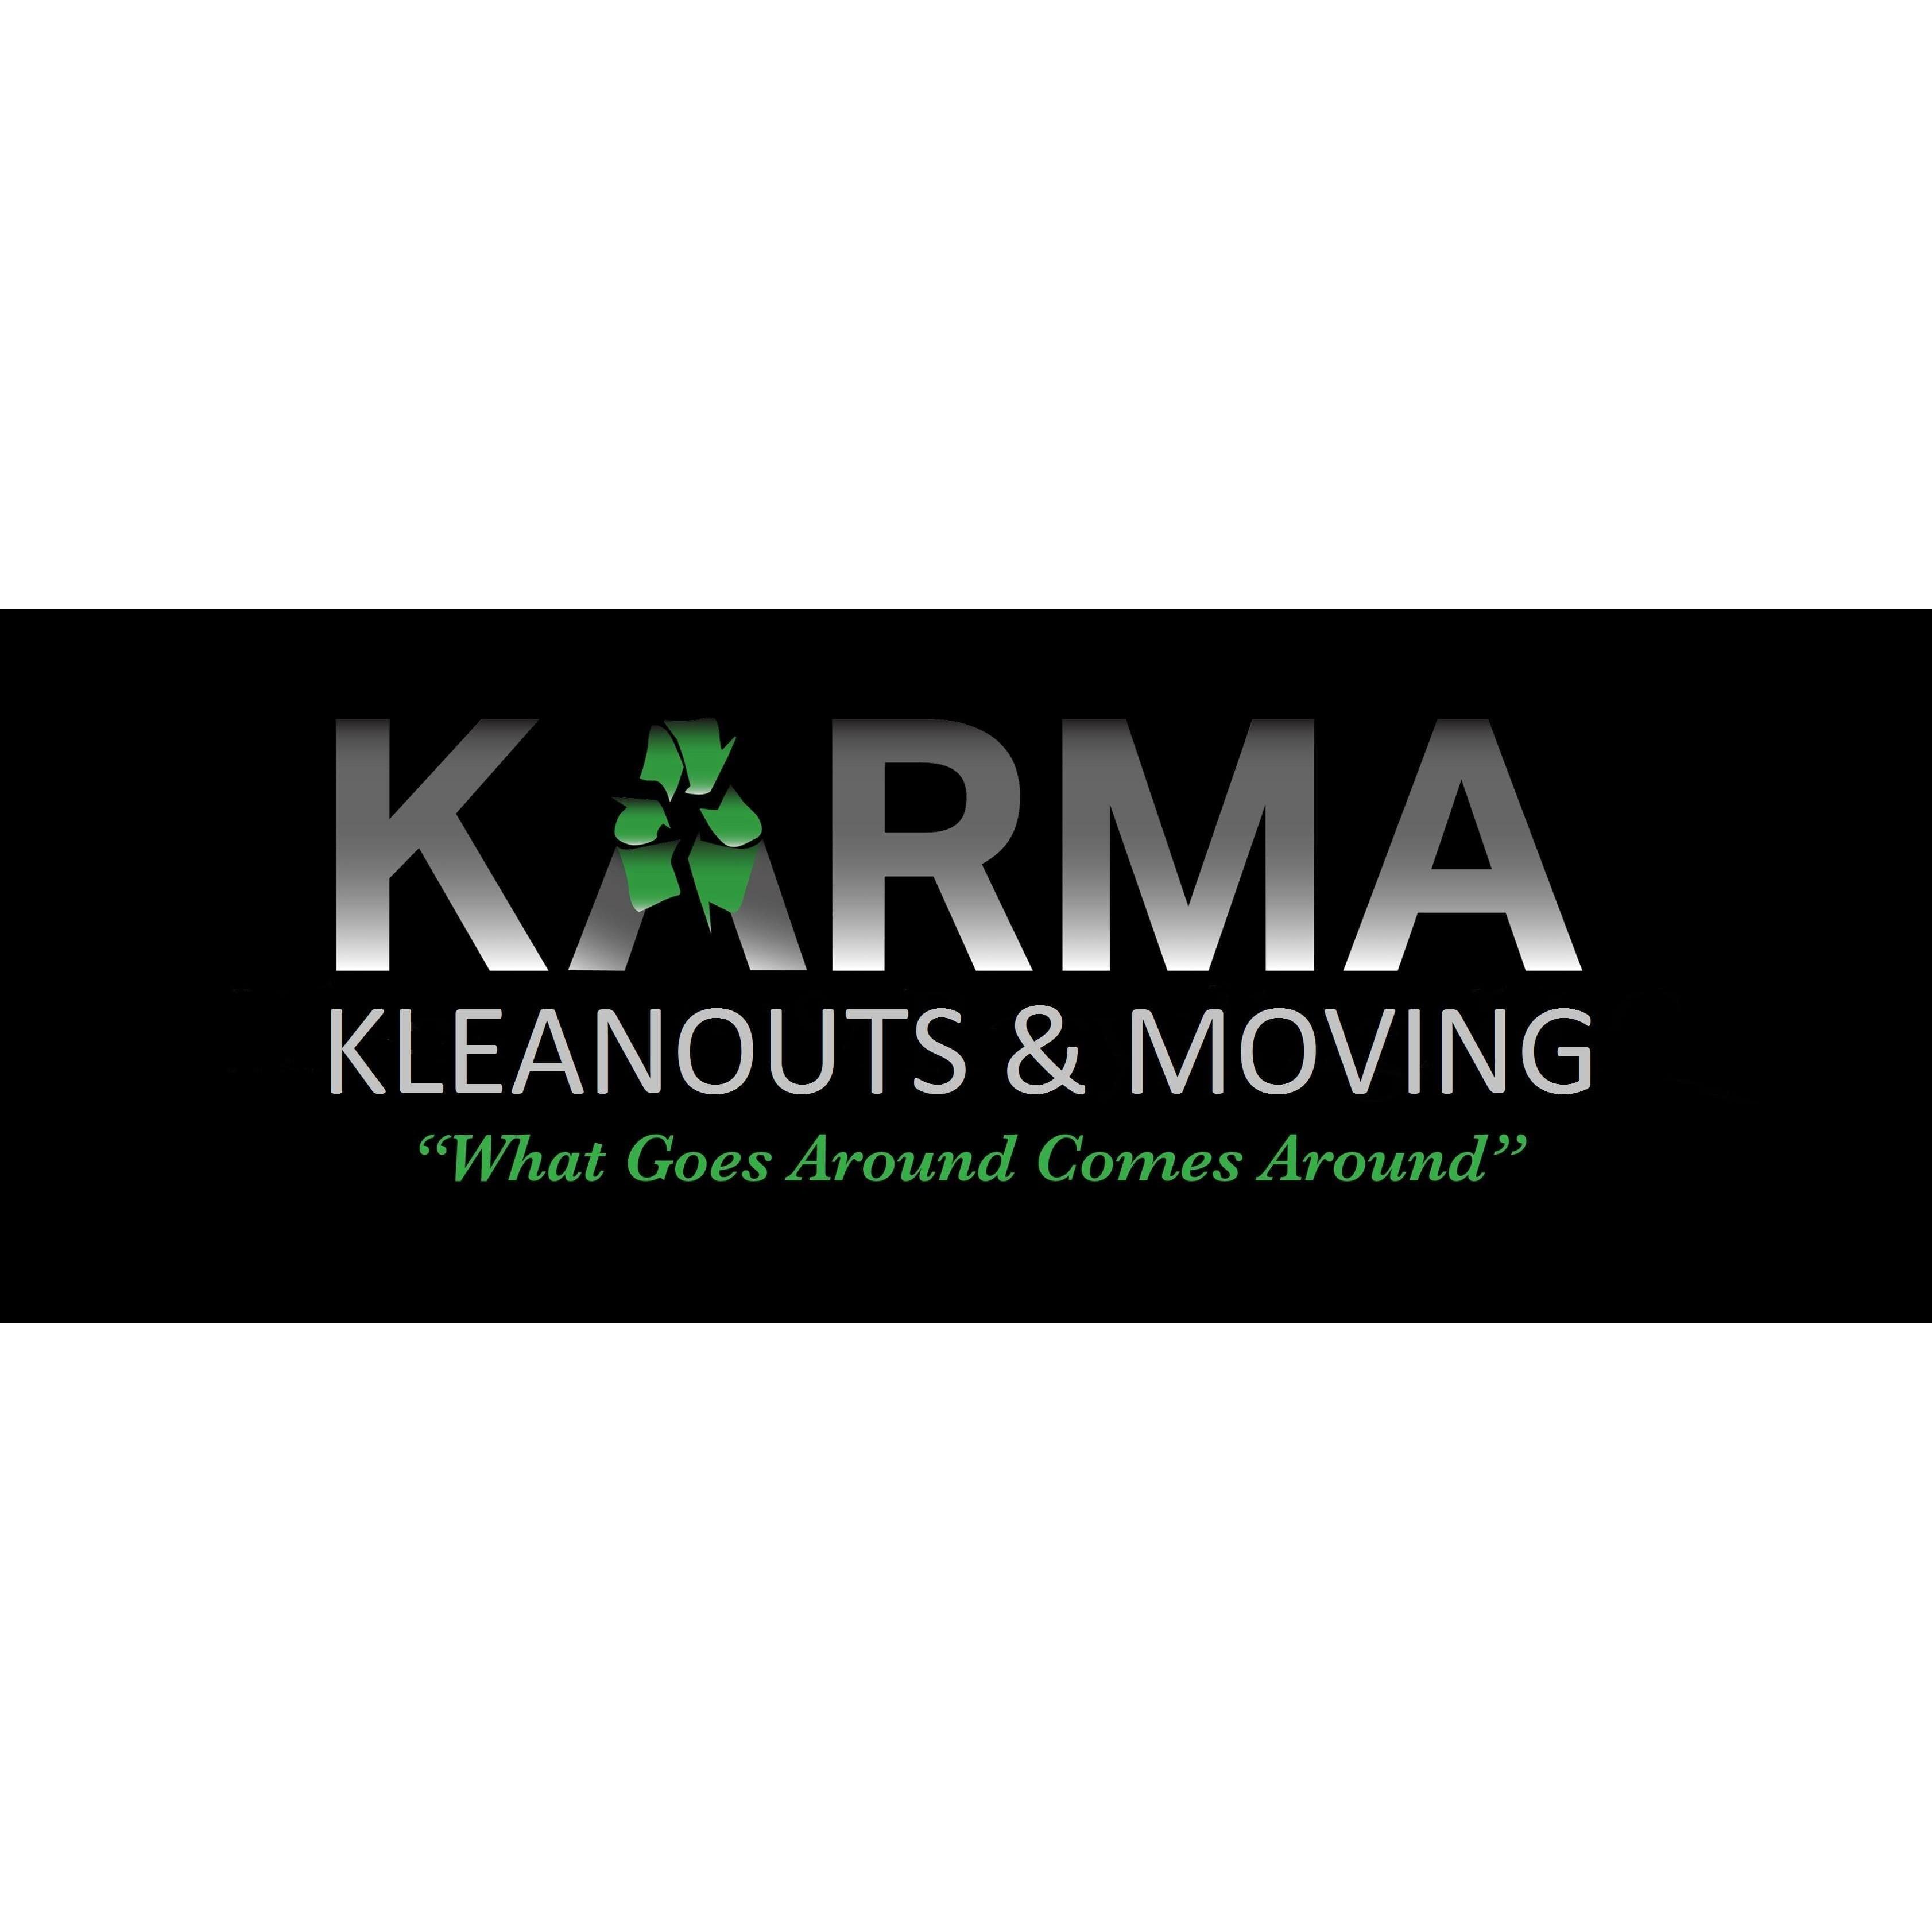 Karma Kleanouts & Moving